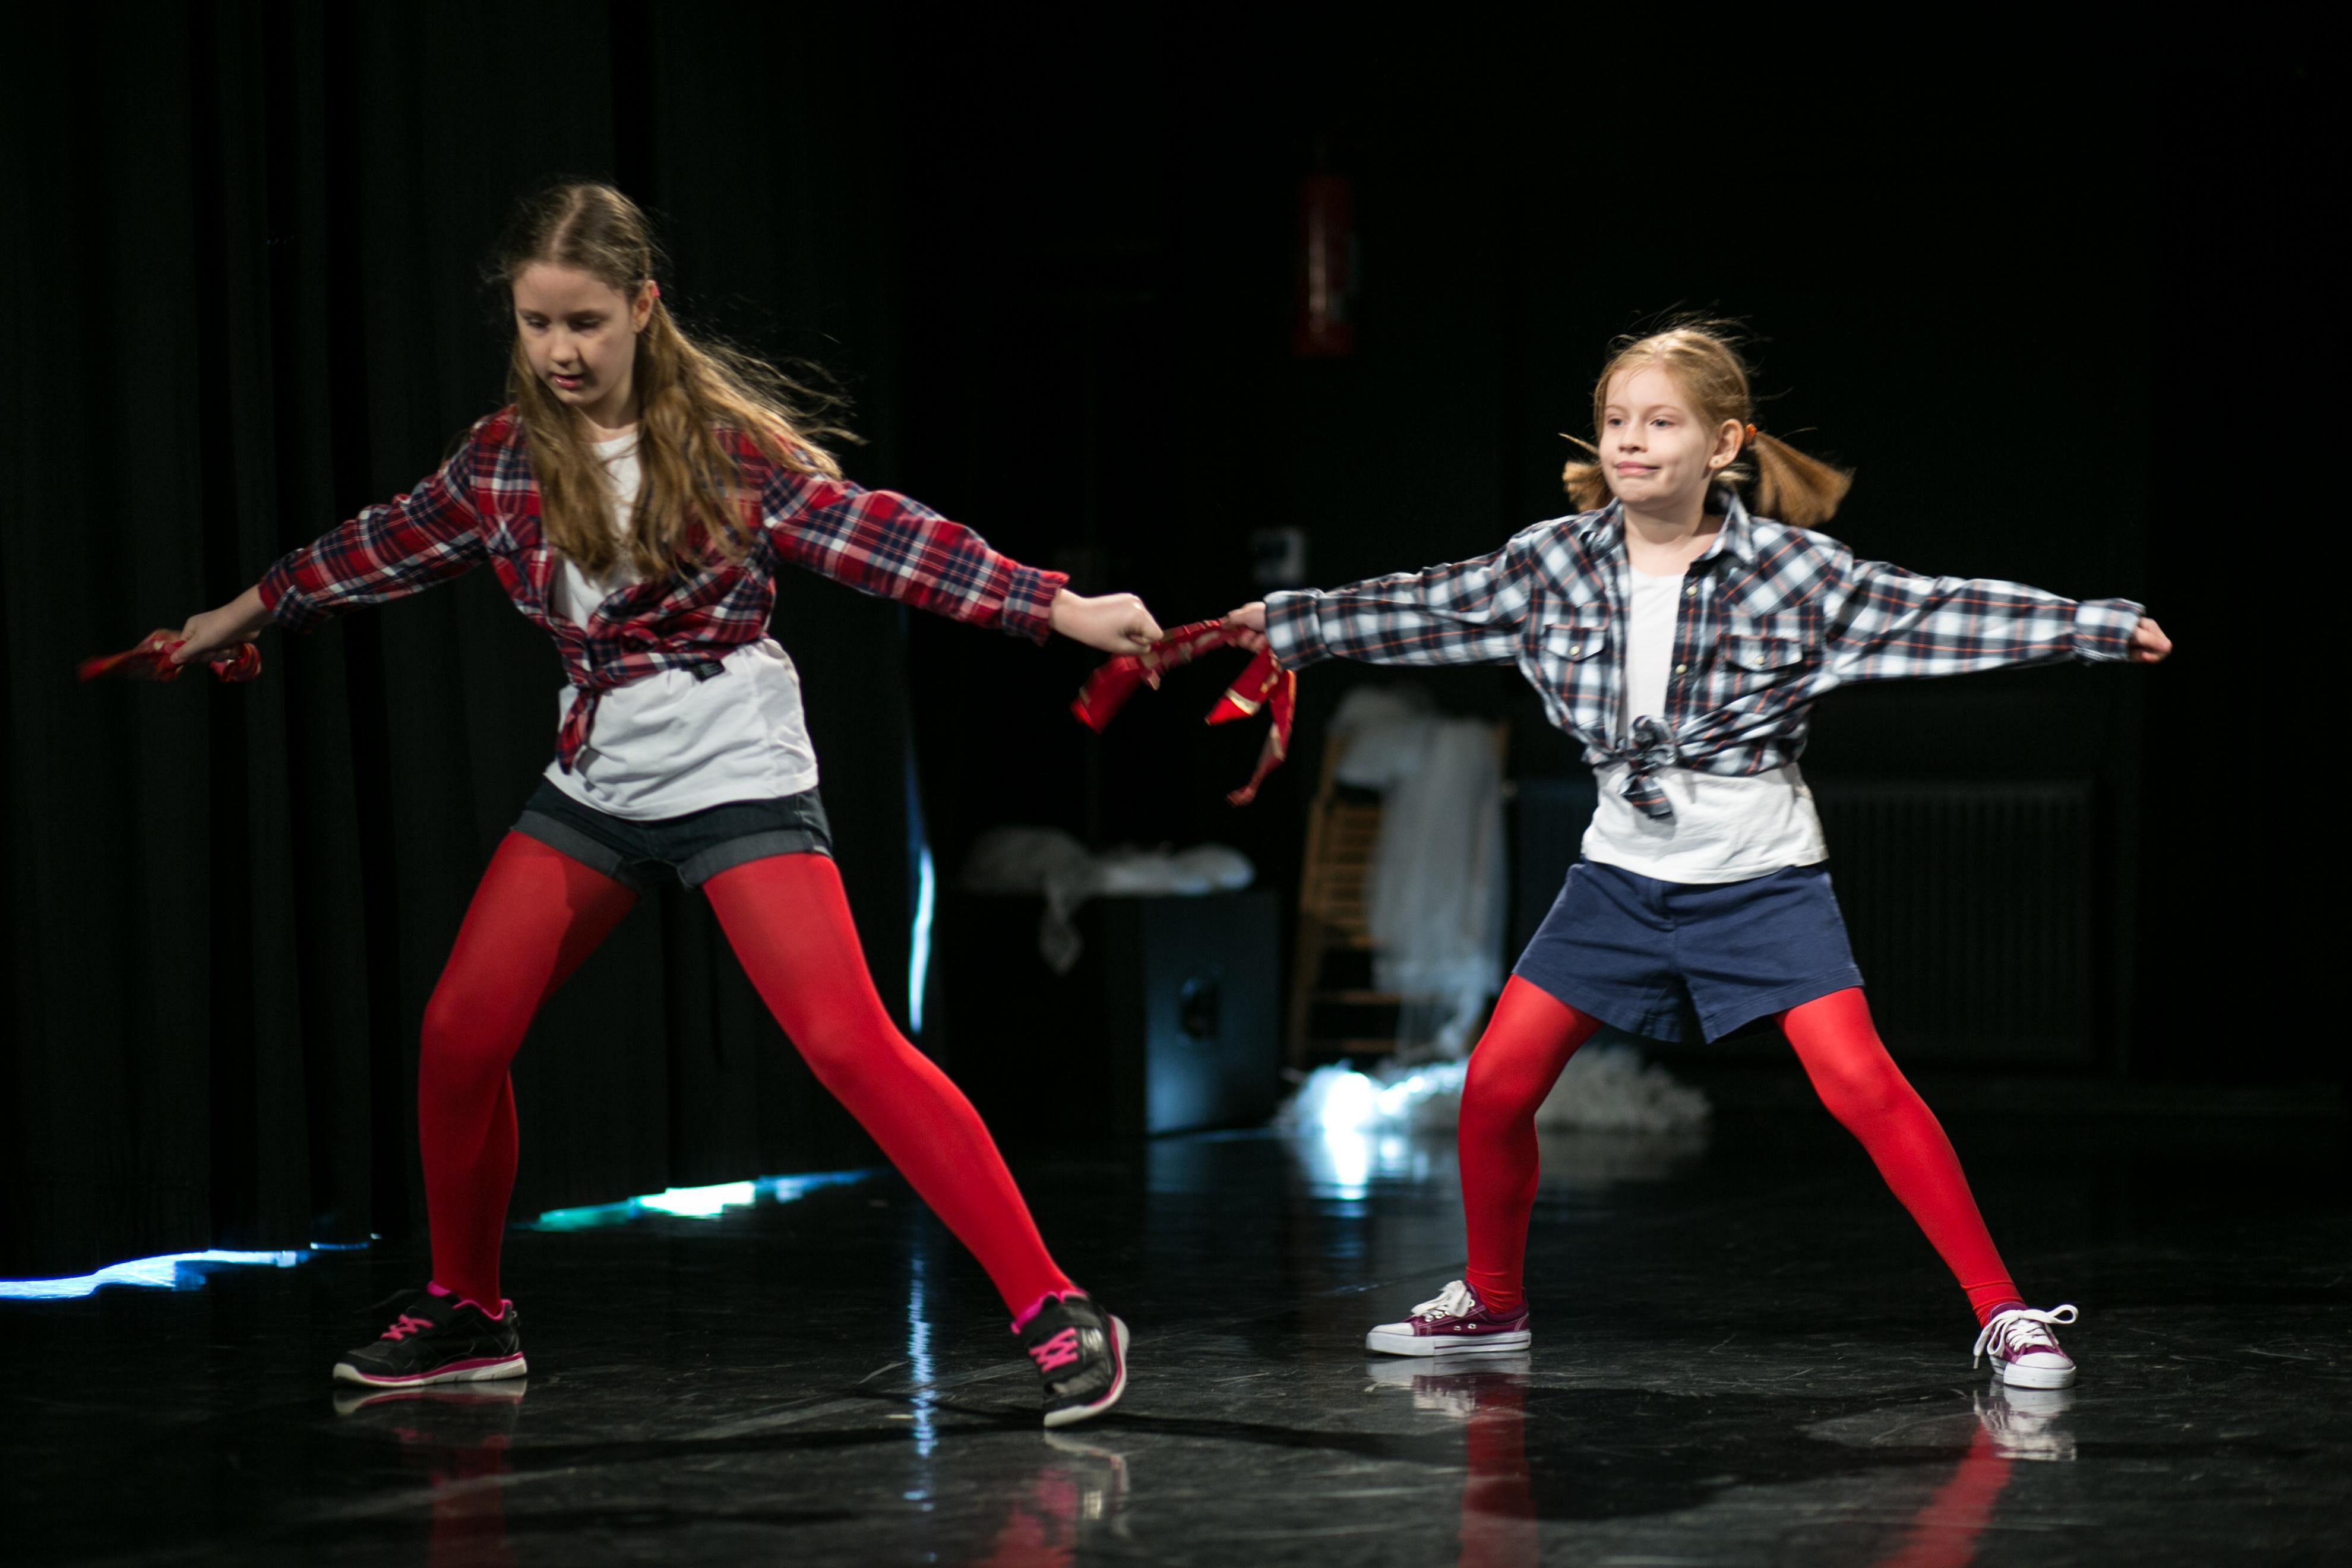 konkurs-taneczny_mokotow-5